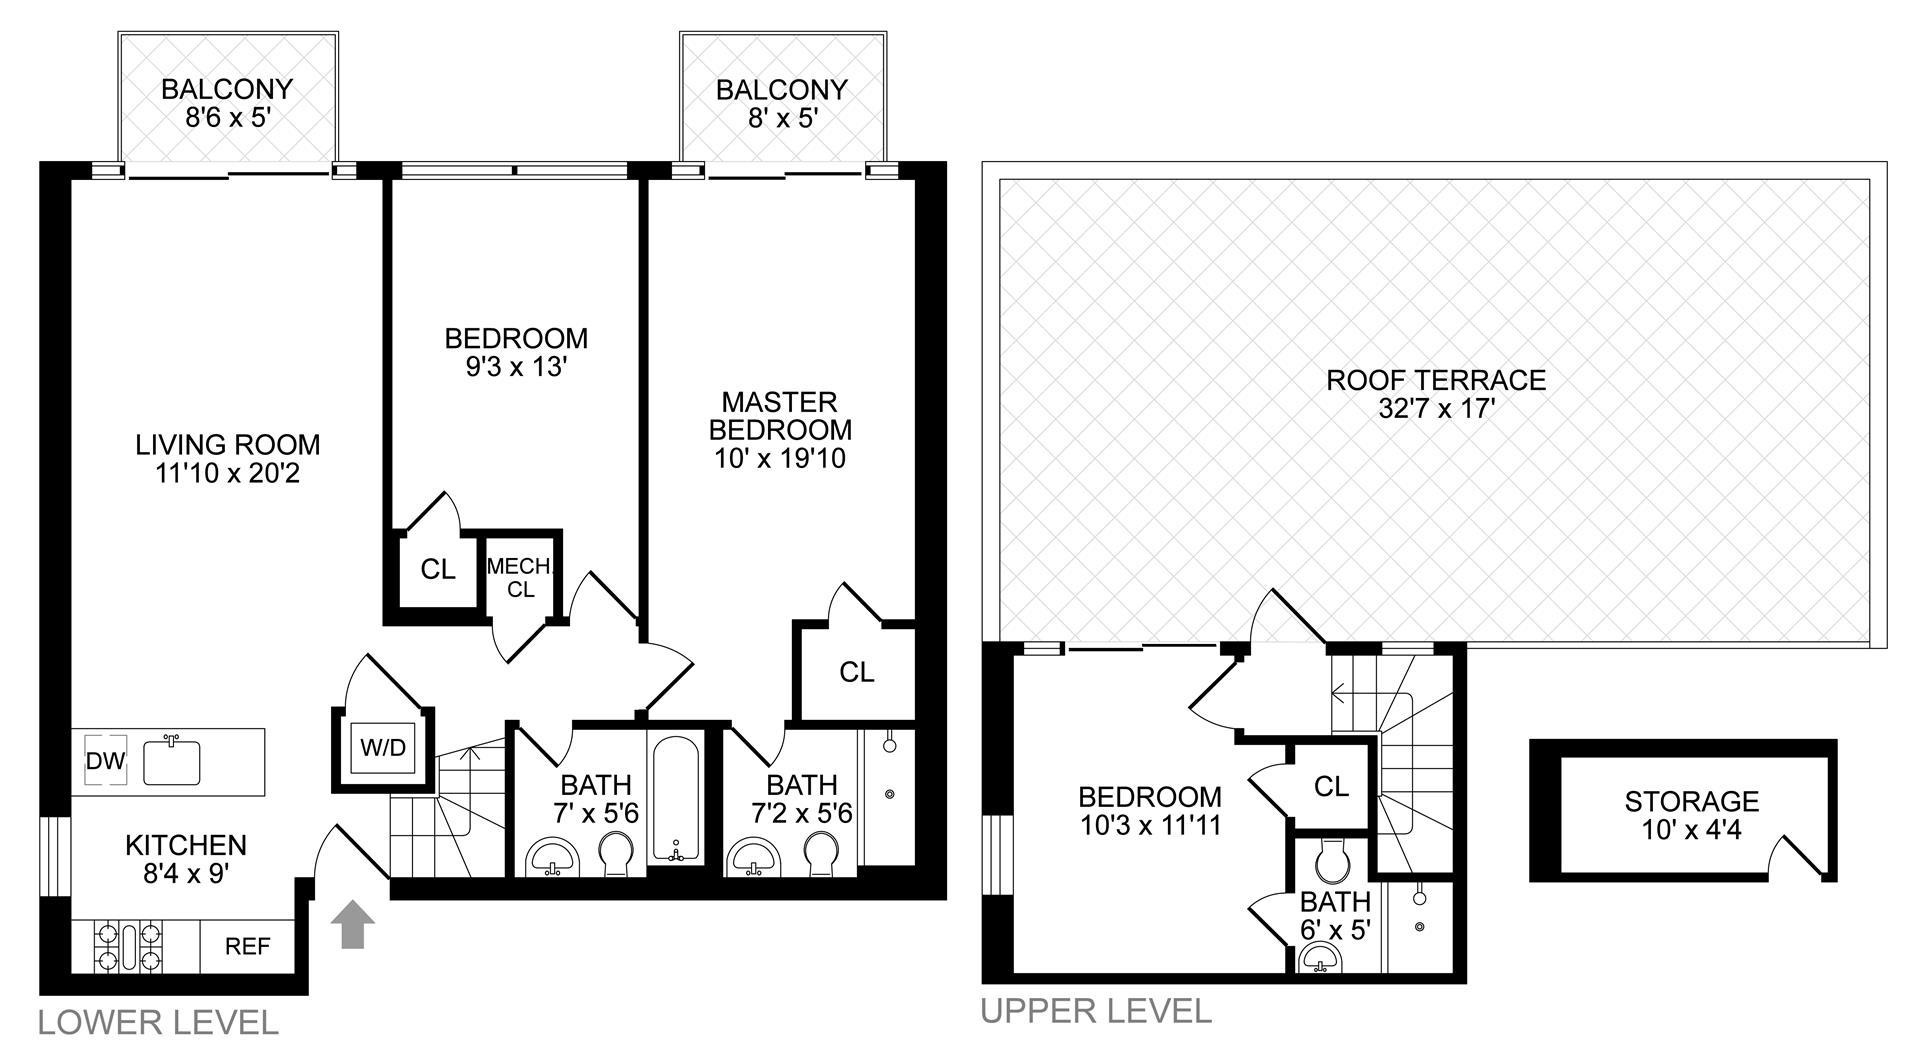 Floor plan of 29 Lexington Avenue, 4B - Clinton Hill, New York